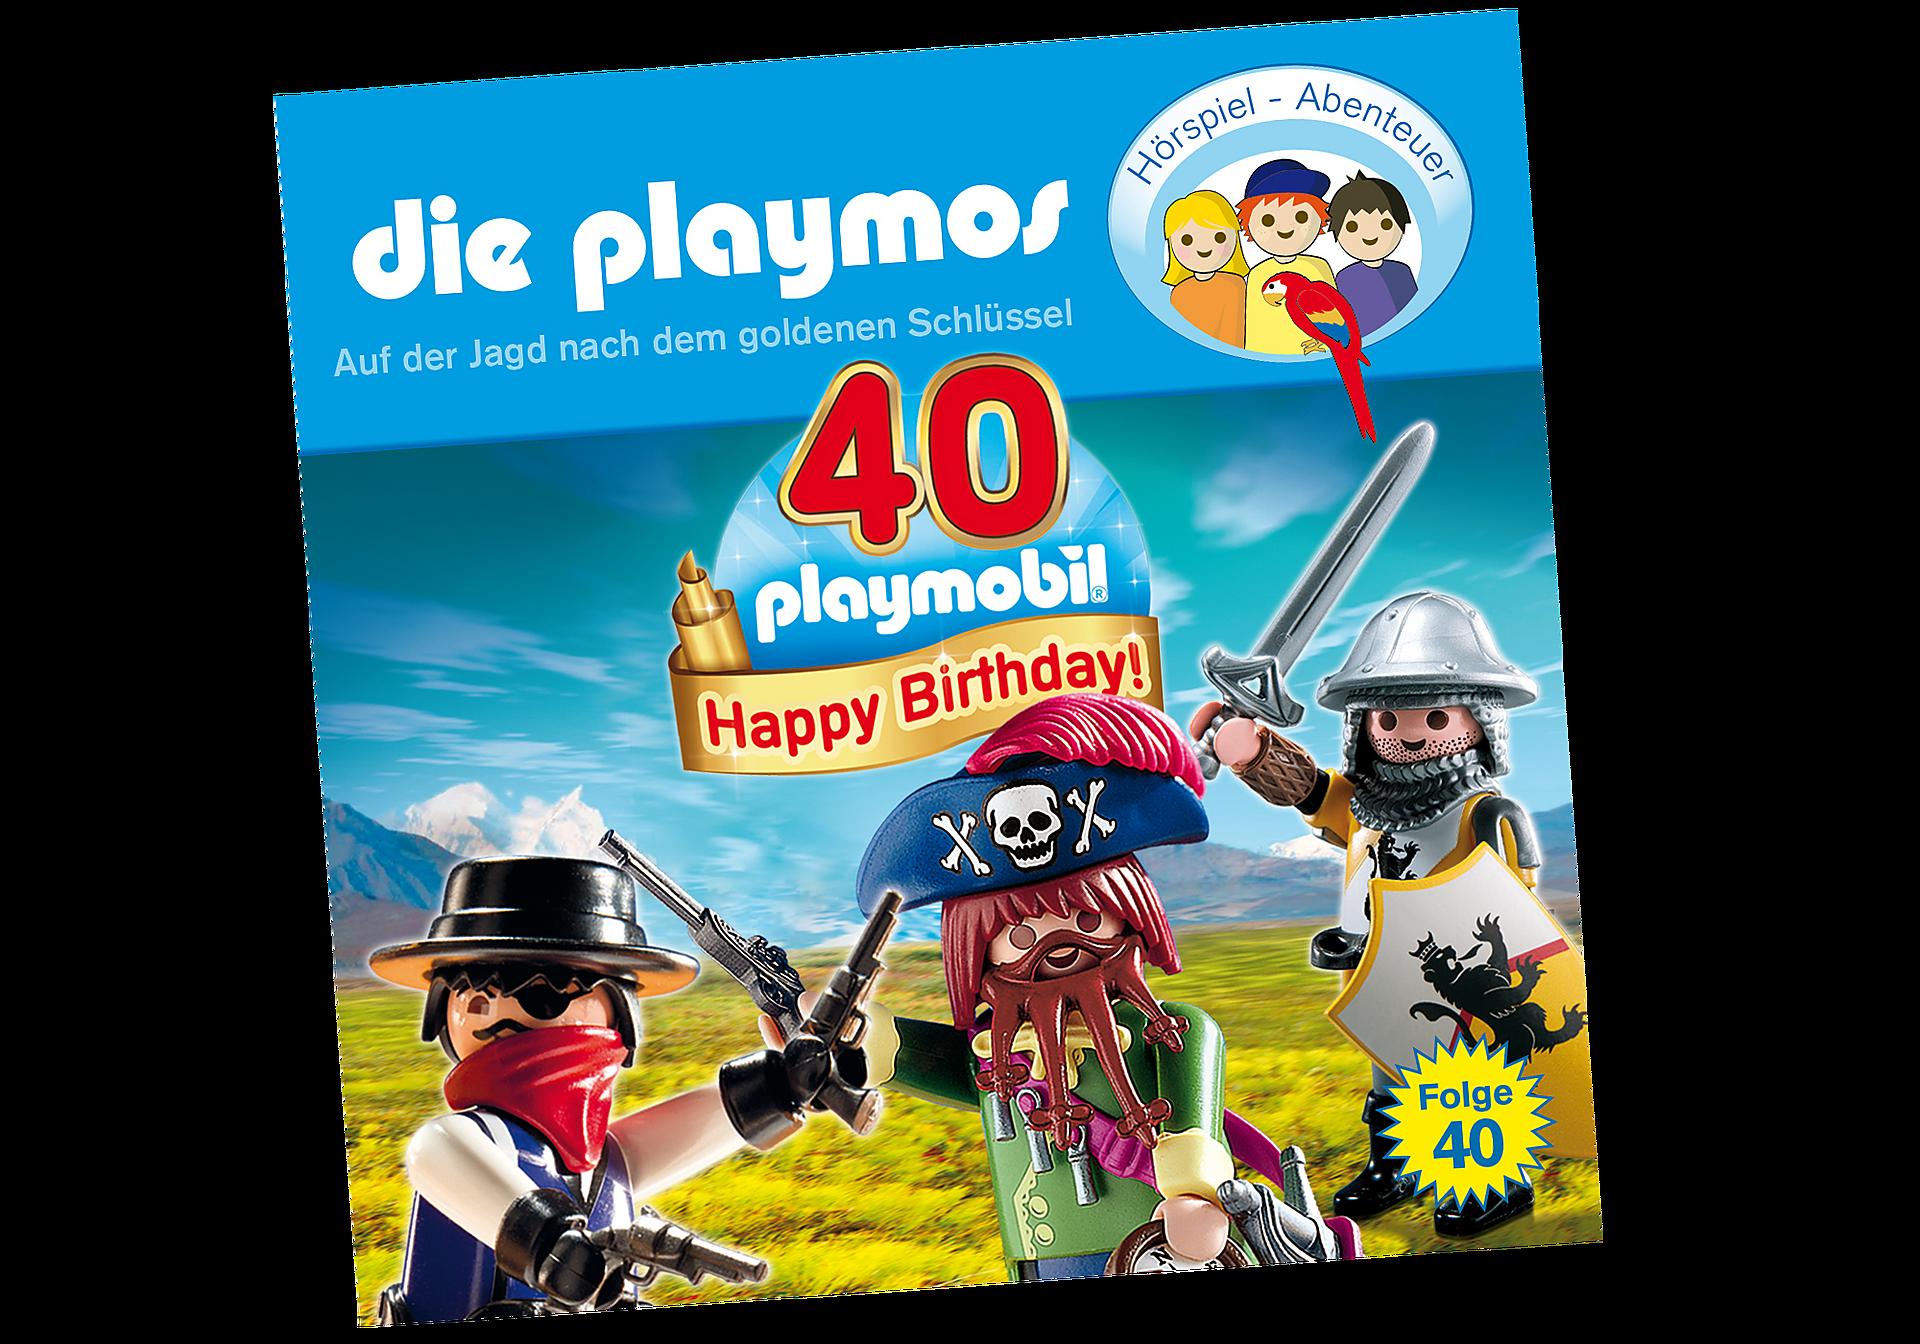 http://media.playmobil.com/i/playmobil/80453_product_detail/Die Jagd nach dem goldenen Schlüssel (40) - CD